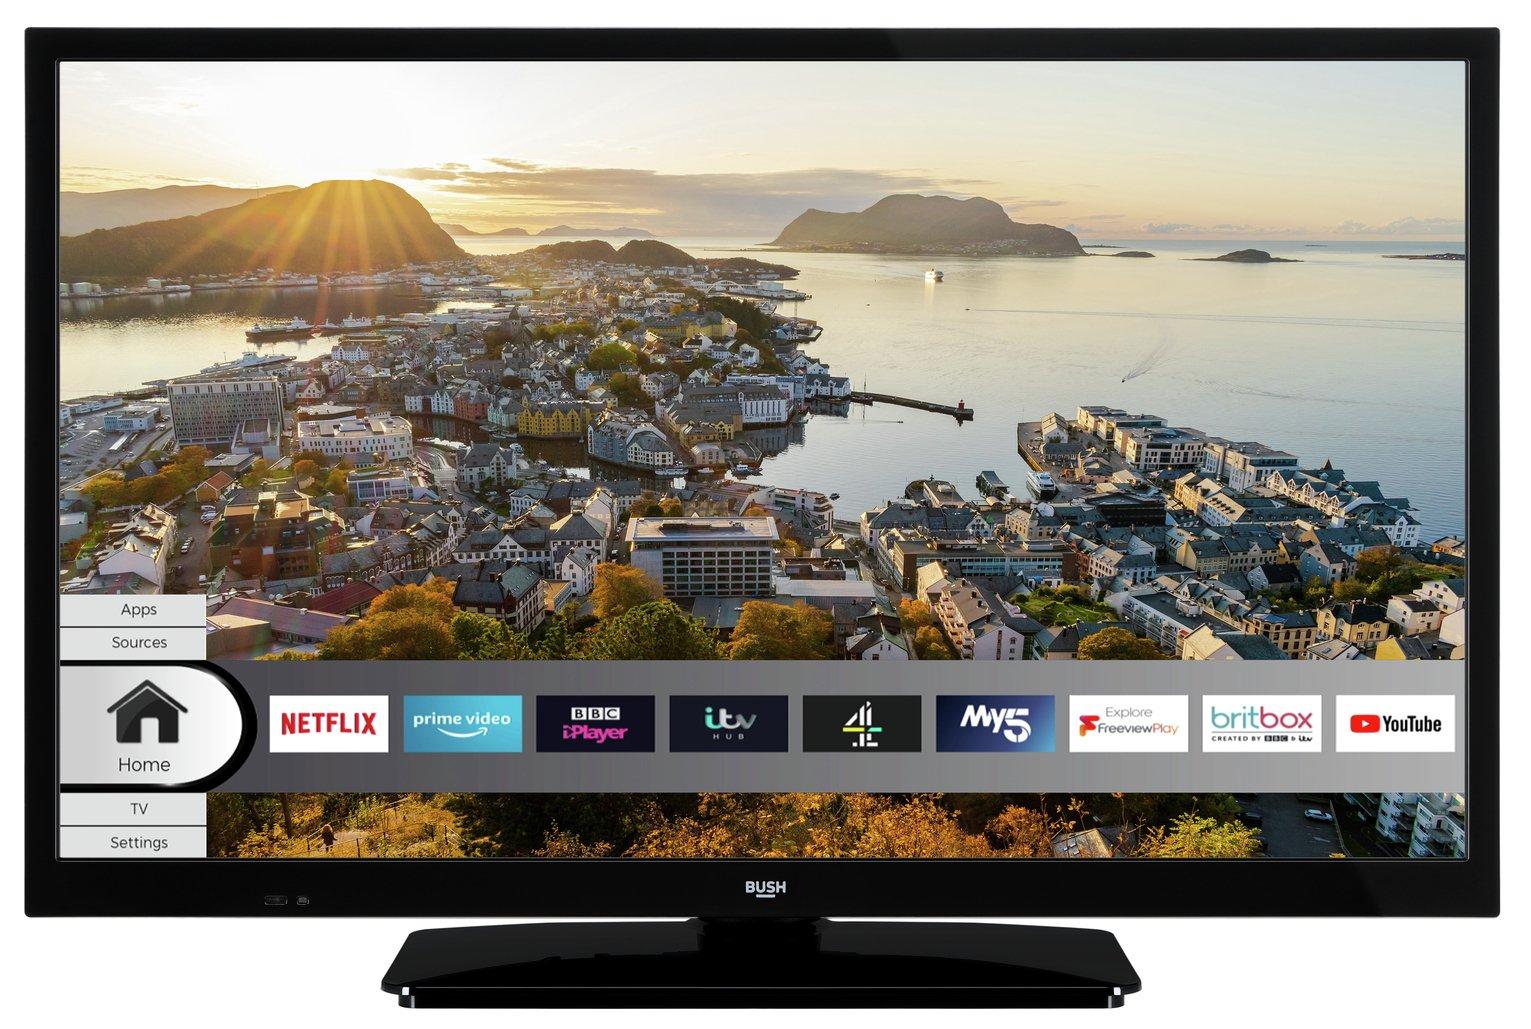 Bush 32 inch HD Smart TV (Refurbished/Returns) - £89.99 in-store @ Argos Clearance Bargains (Stanley)